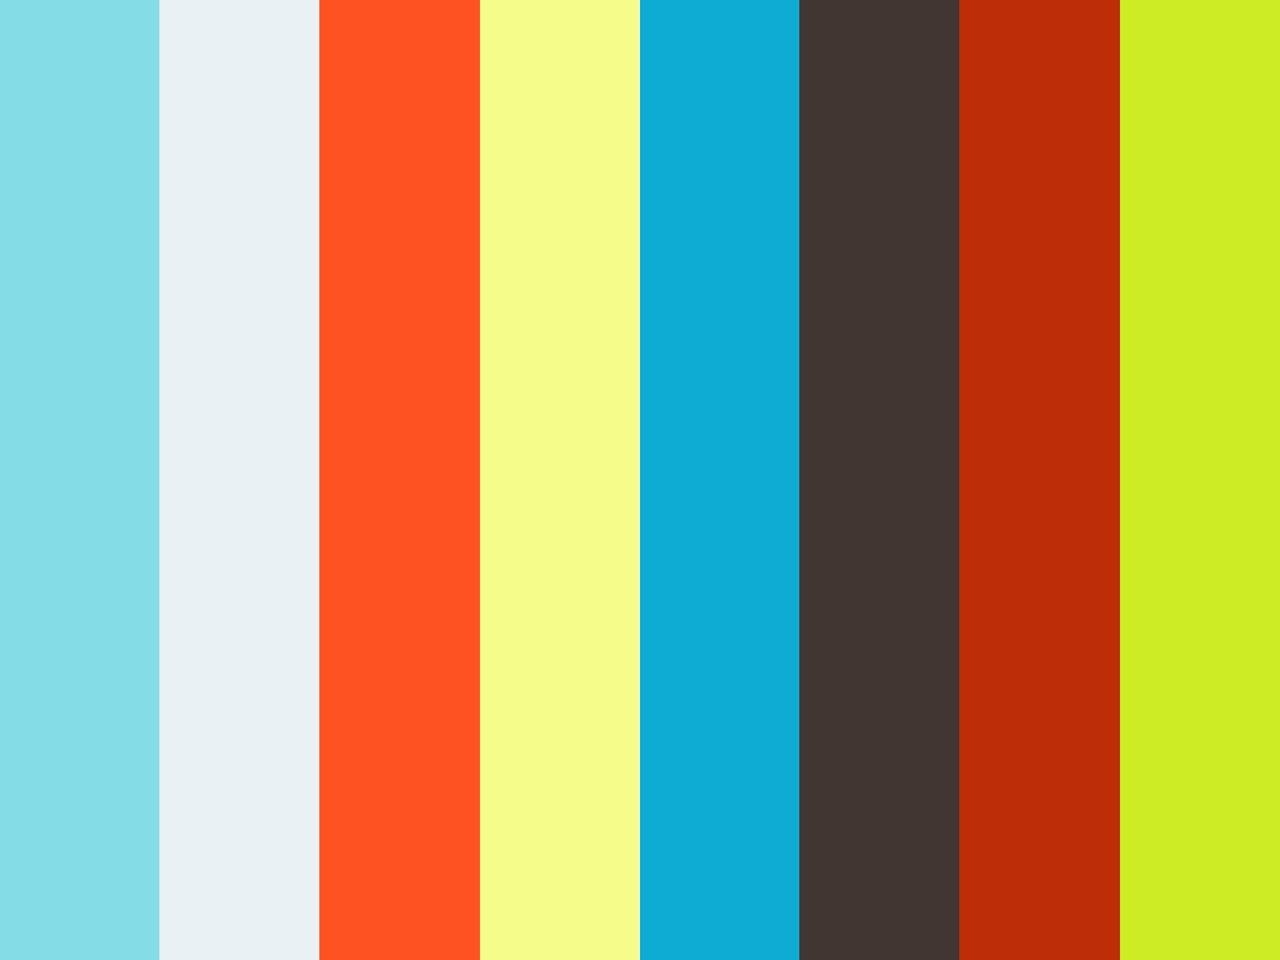 Color Me Loco 2015